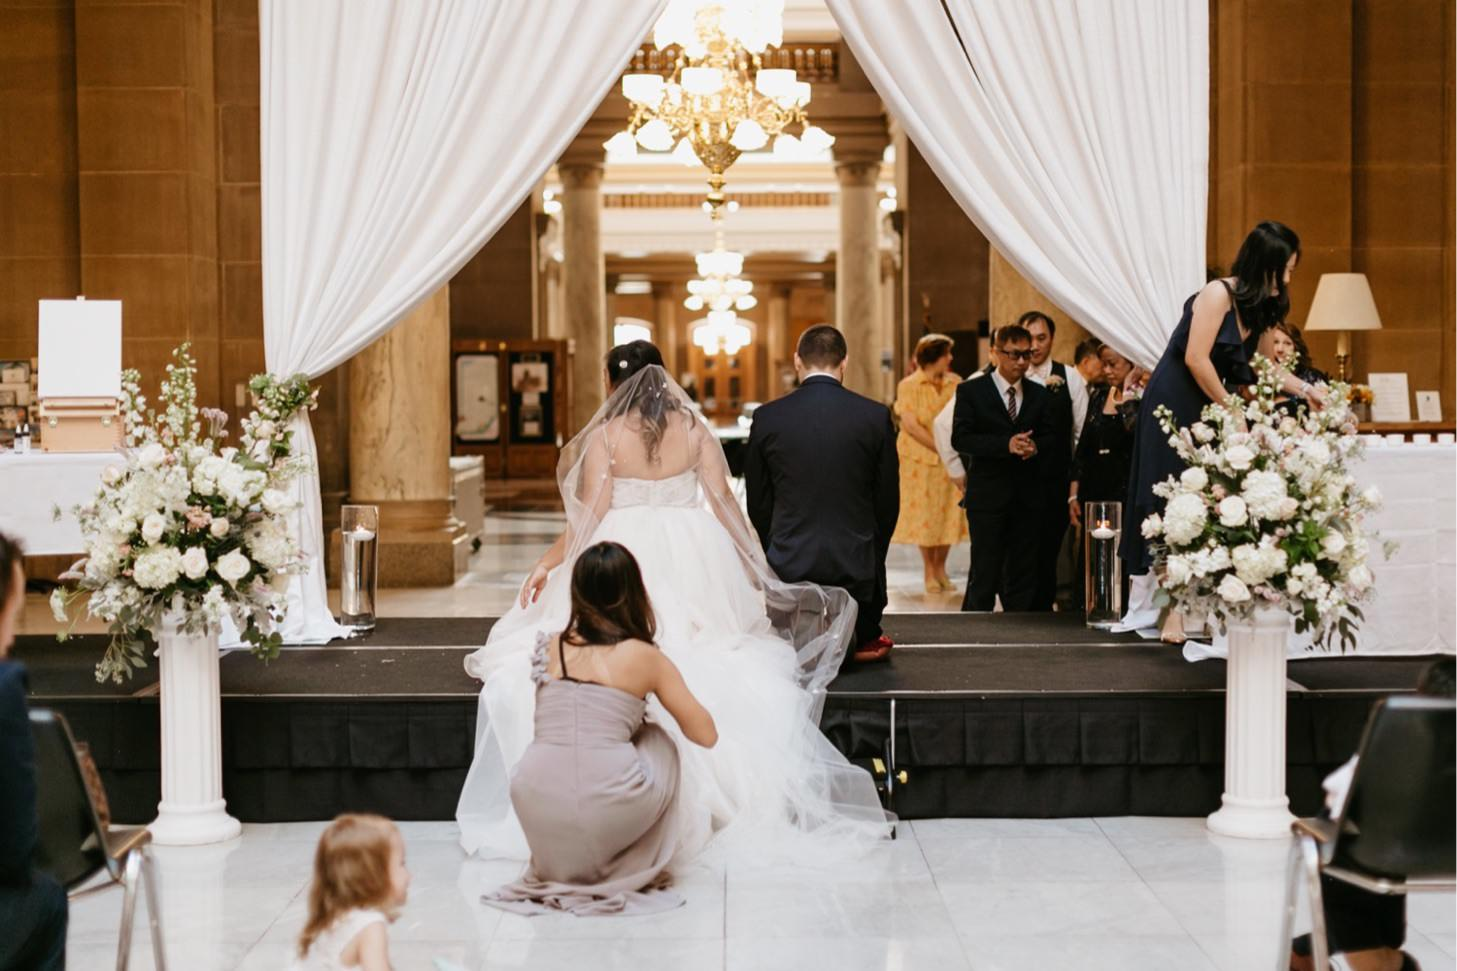 indiana-state-house-wedding-downtown-indianapolis-wedding-photographer040.JPG